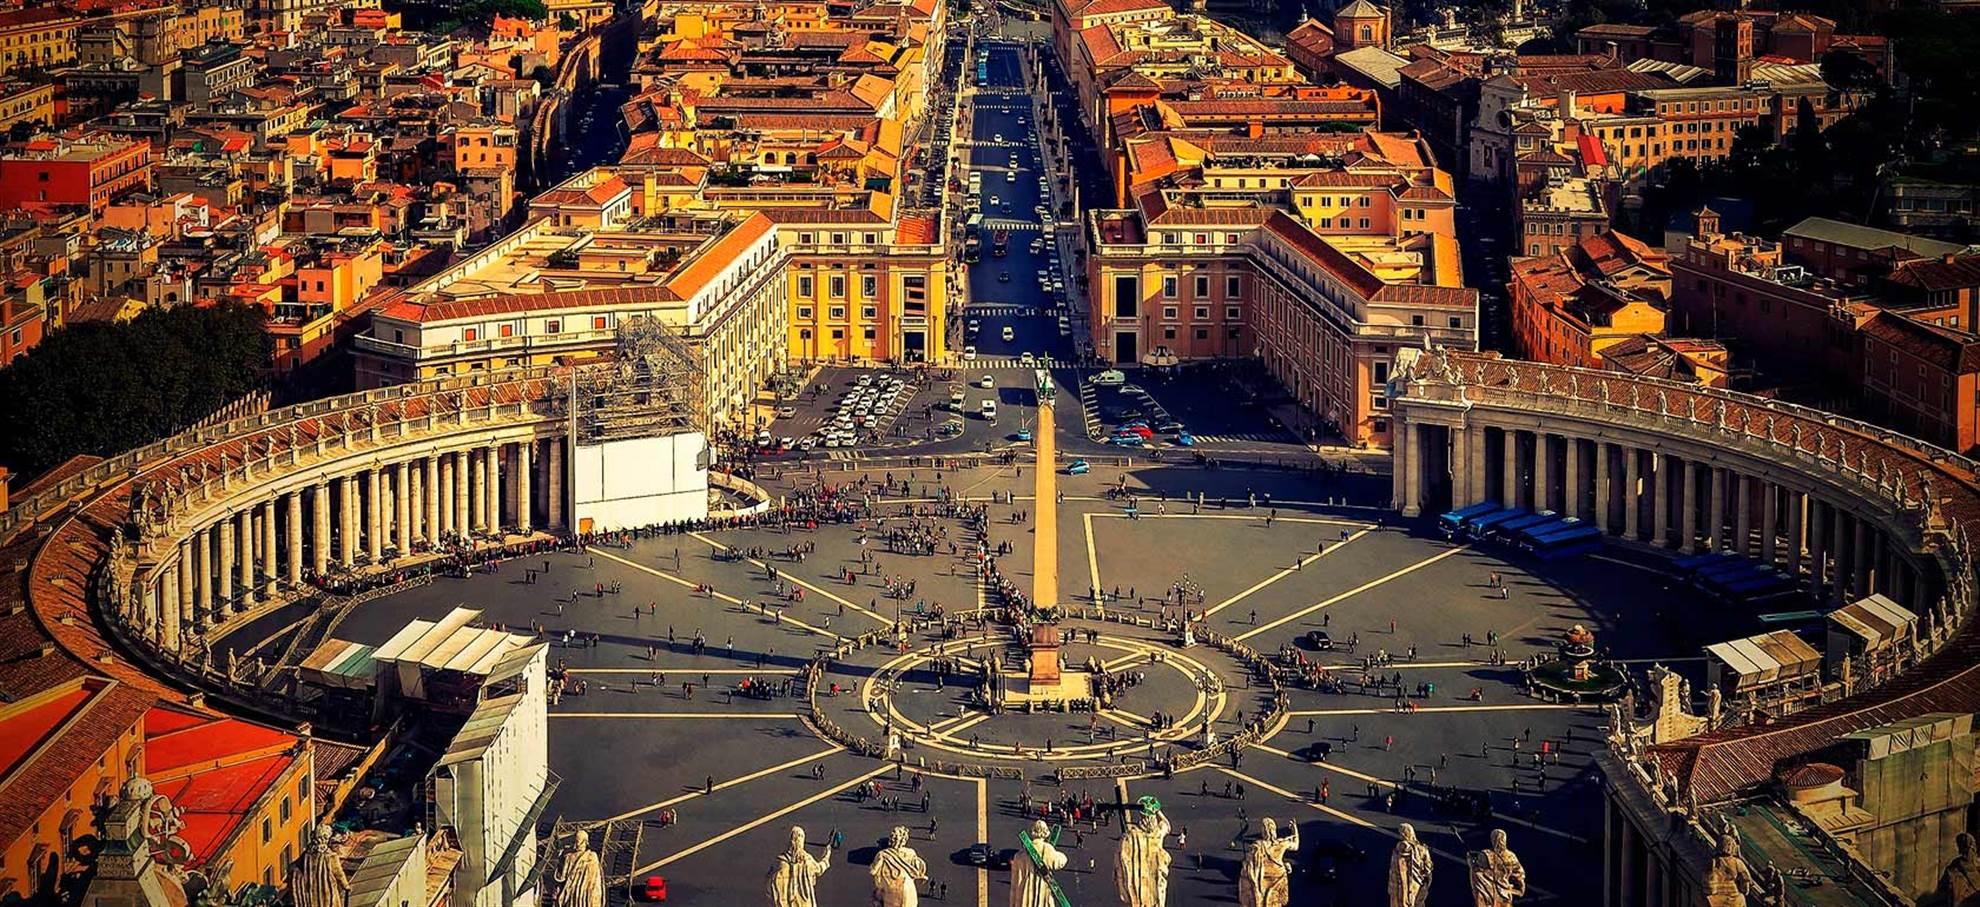 Vatikanische Museen & Sixtinische Kapelle